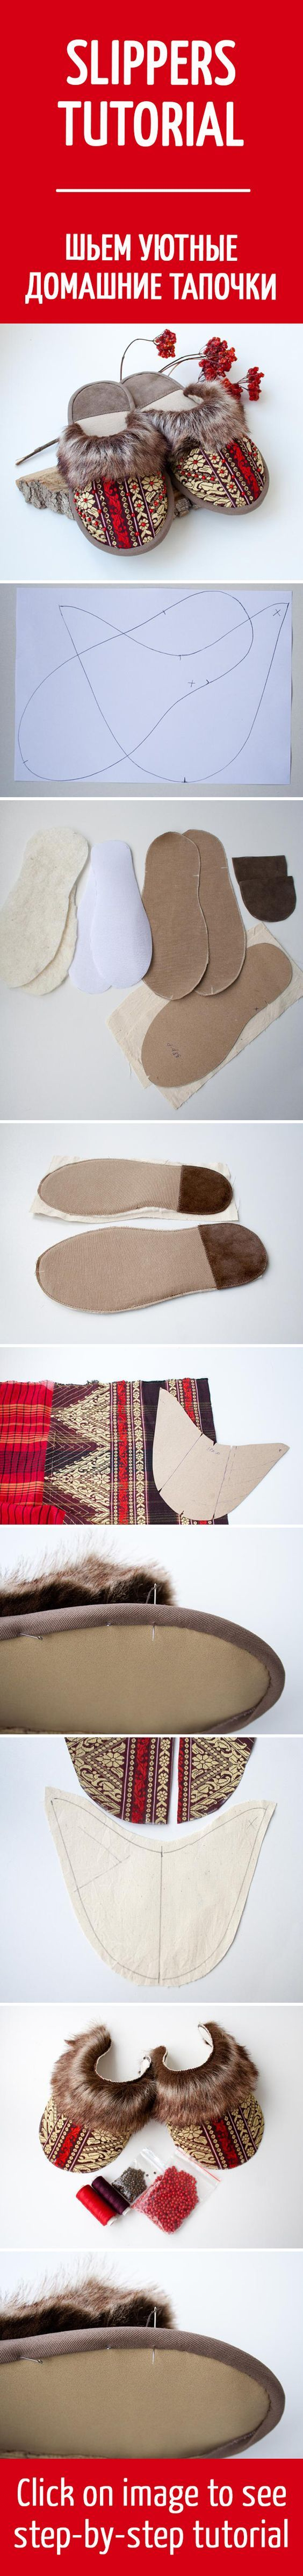 Шьем уютные домашние тапочки «Сударушка» / How to sew slippers tutorial: